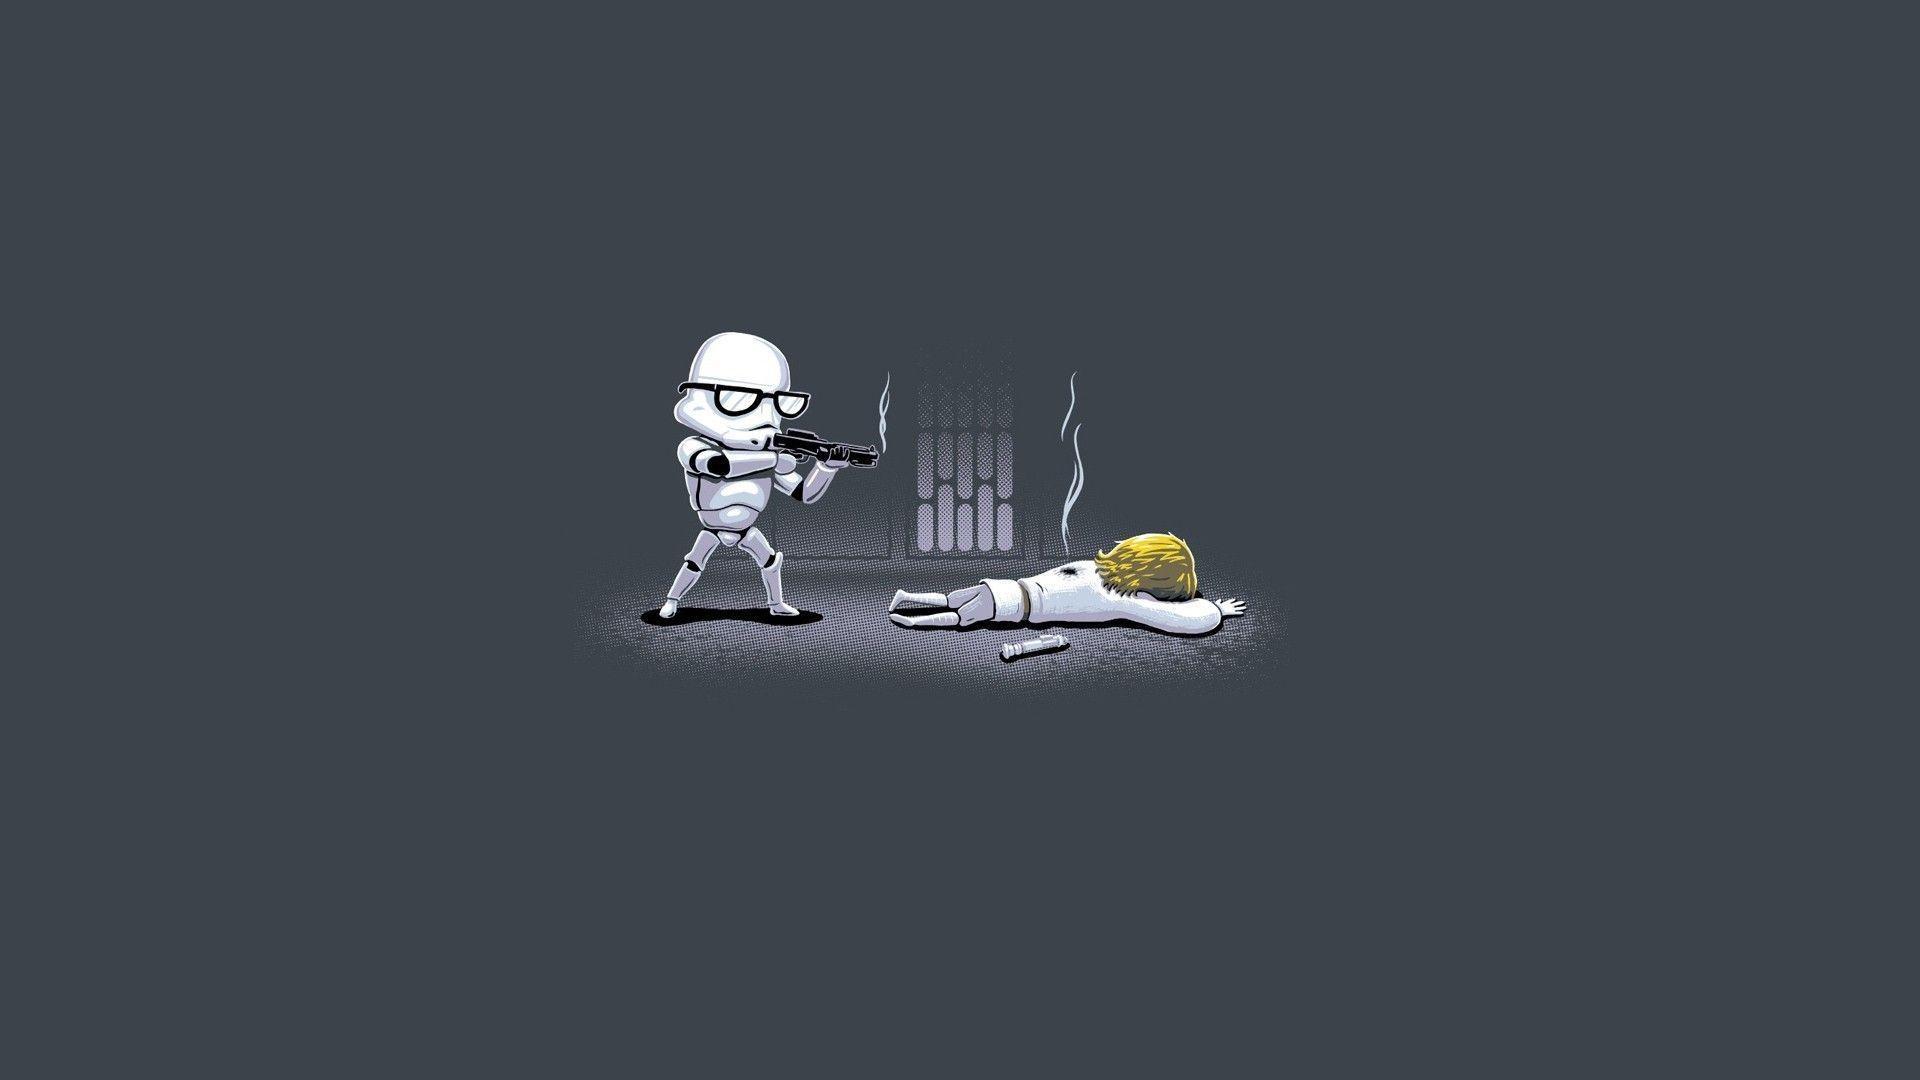 Minimalist Star Wars Funny Wallpapers Top Free Minimalist Star Wars Funny Backgrounds Wallpaperaccess